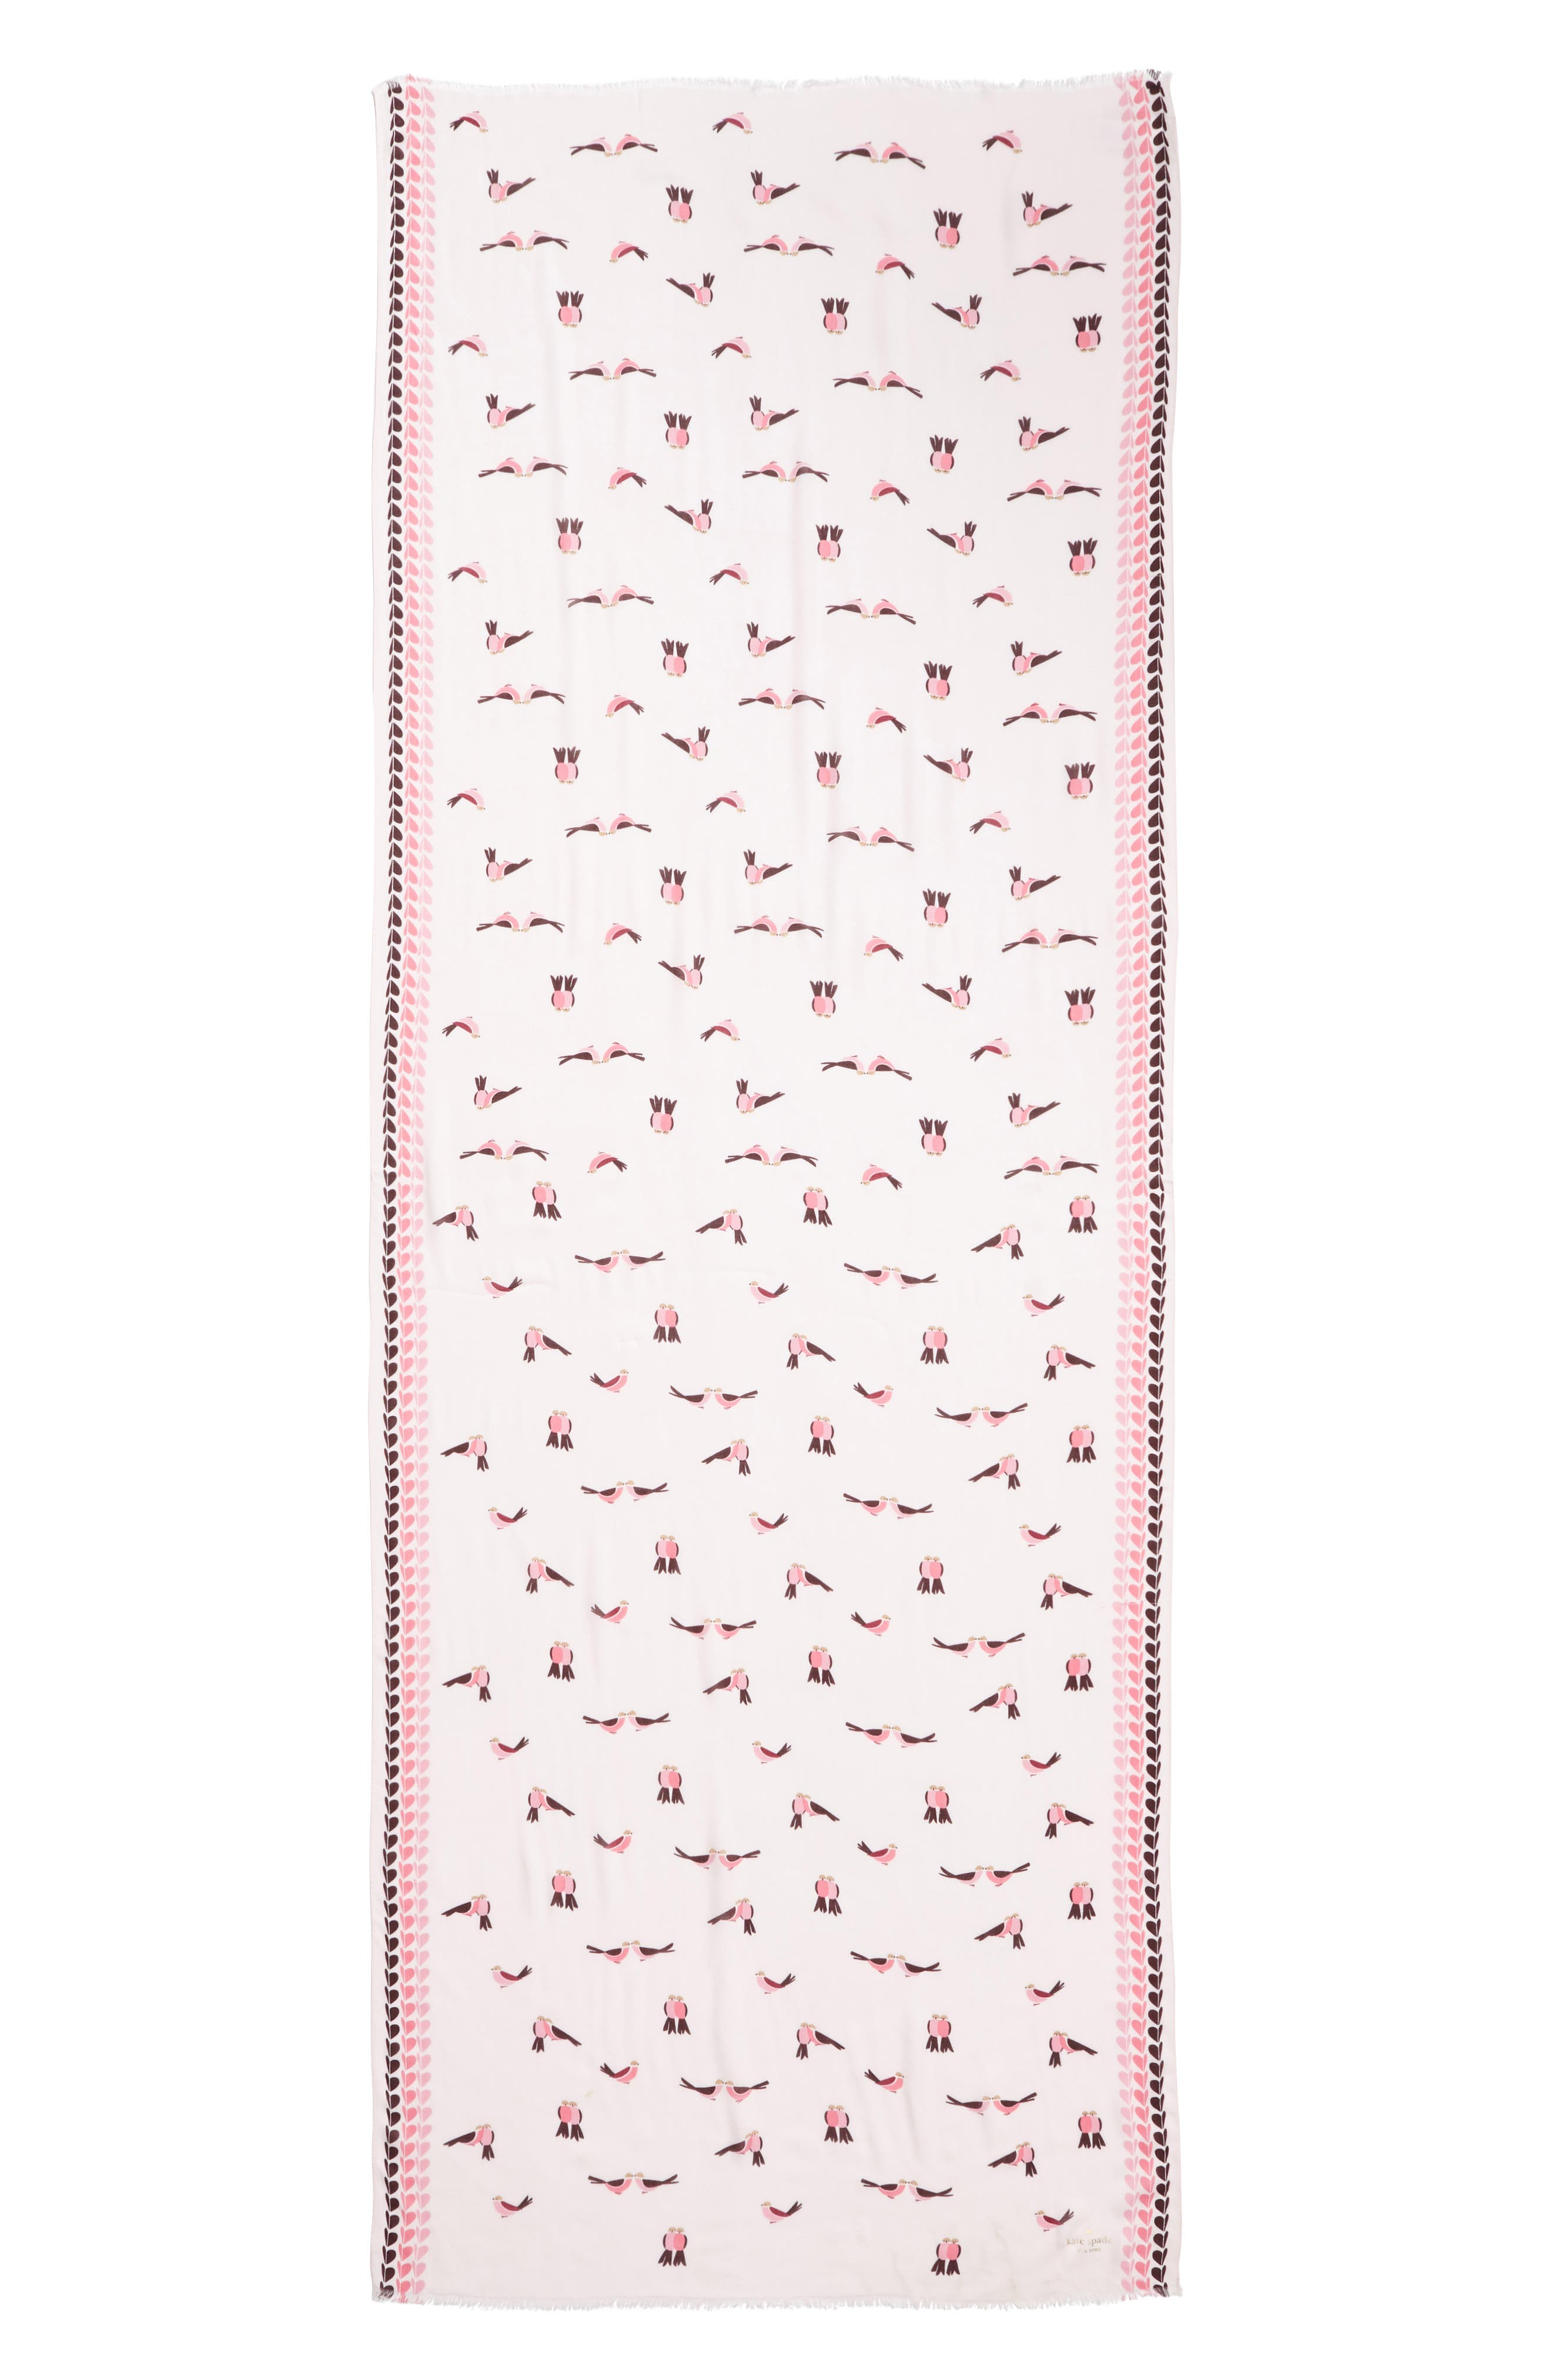 KATE SPADE NEW YORK,                             lovebirds scarf,                             Alternate thumbnail 3, color,                             PINK MAJOLICA